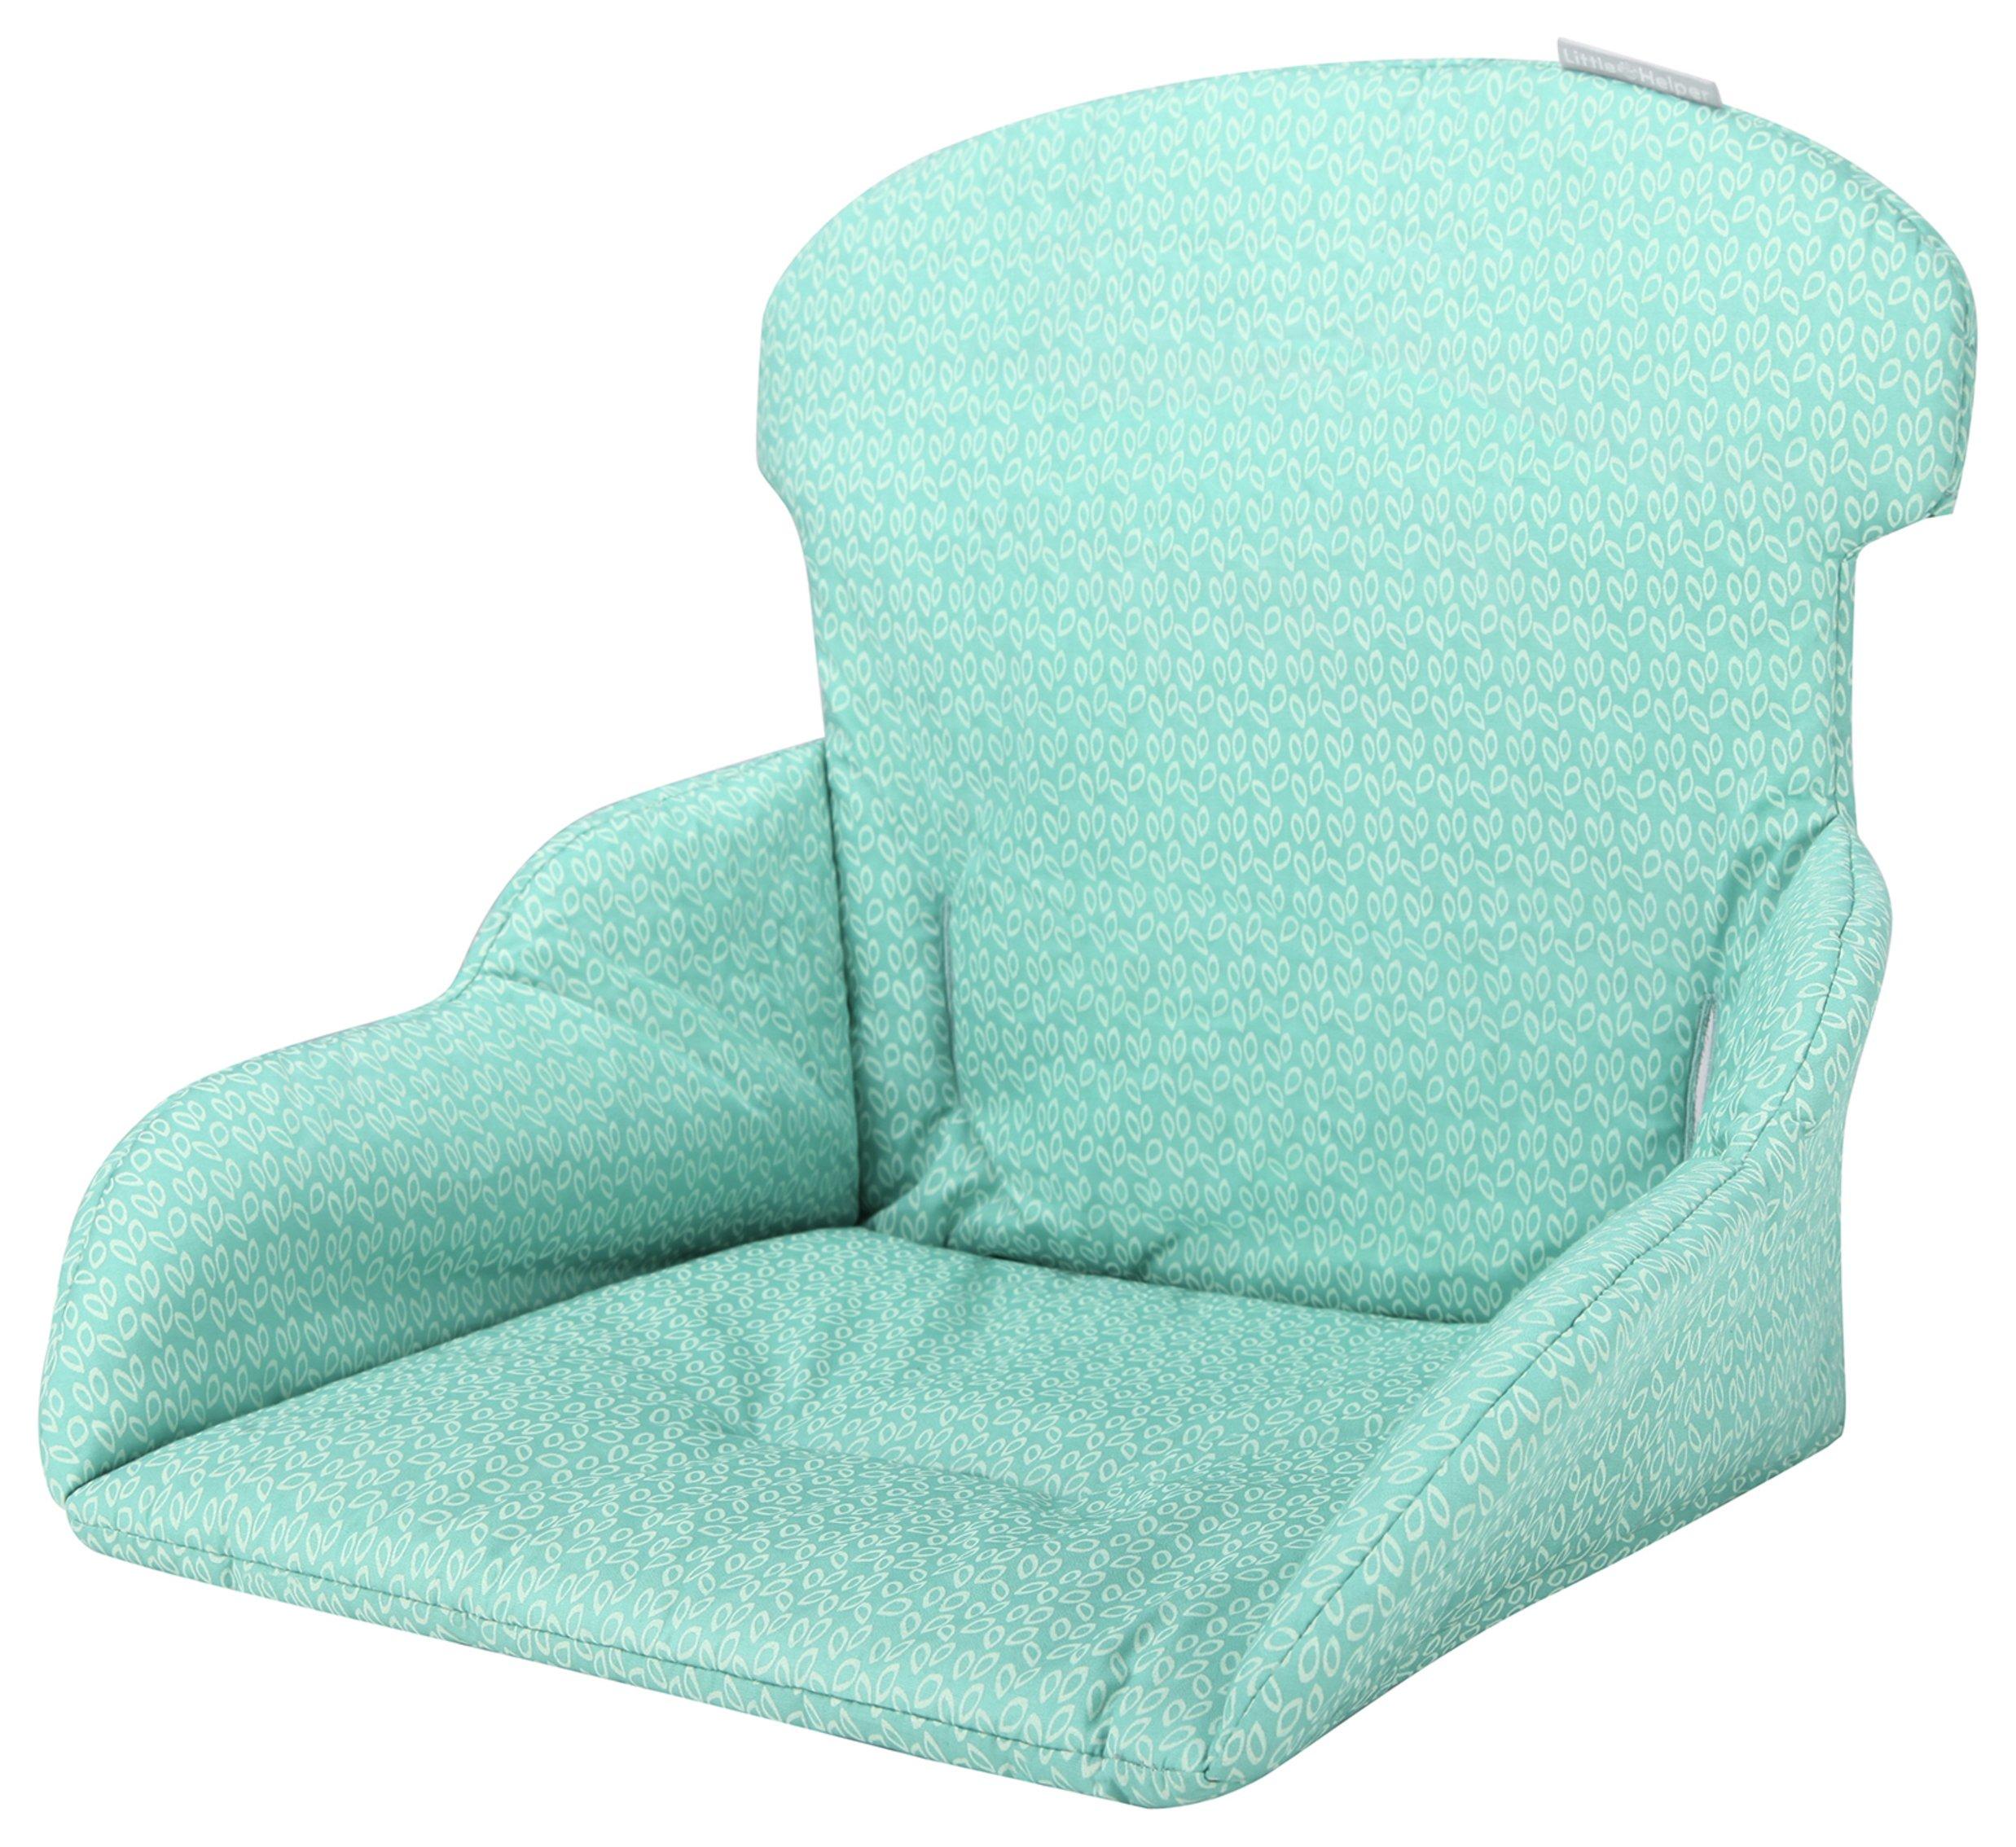 Image of Little Helper FunPod High Chair Cushion - Turquosie